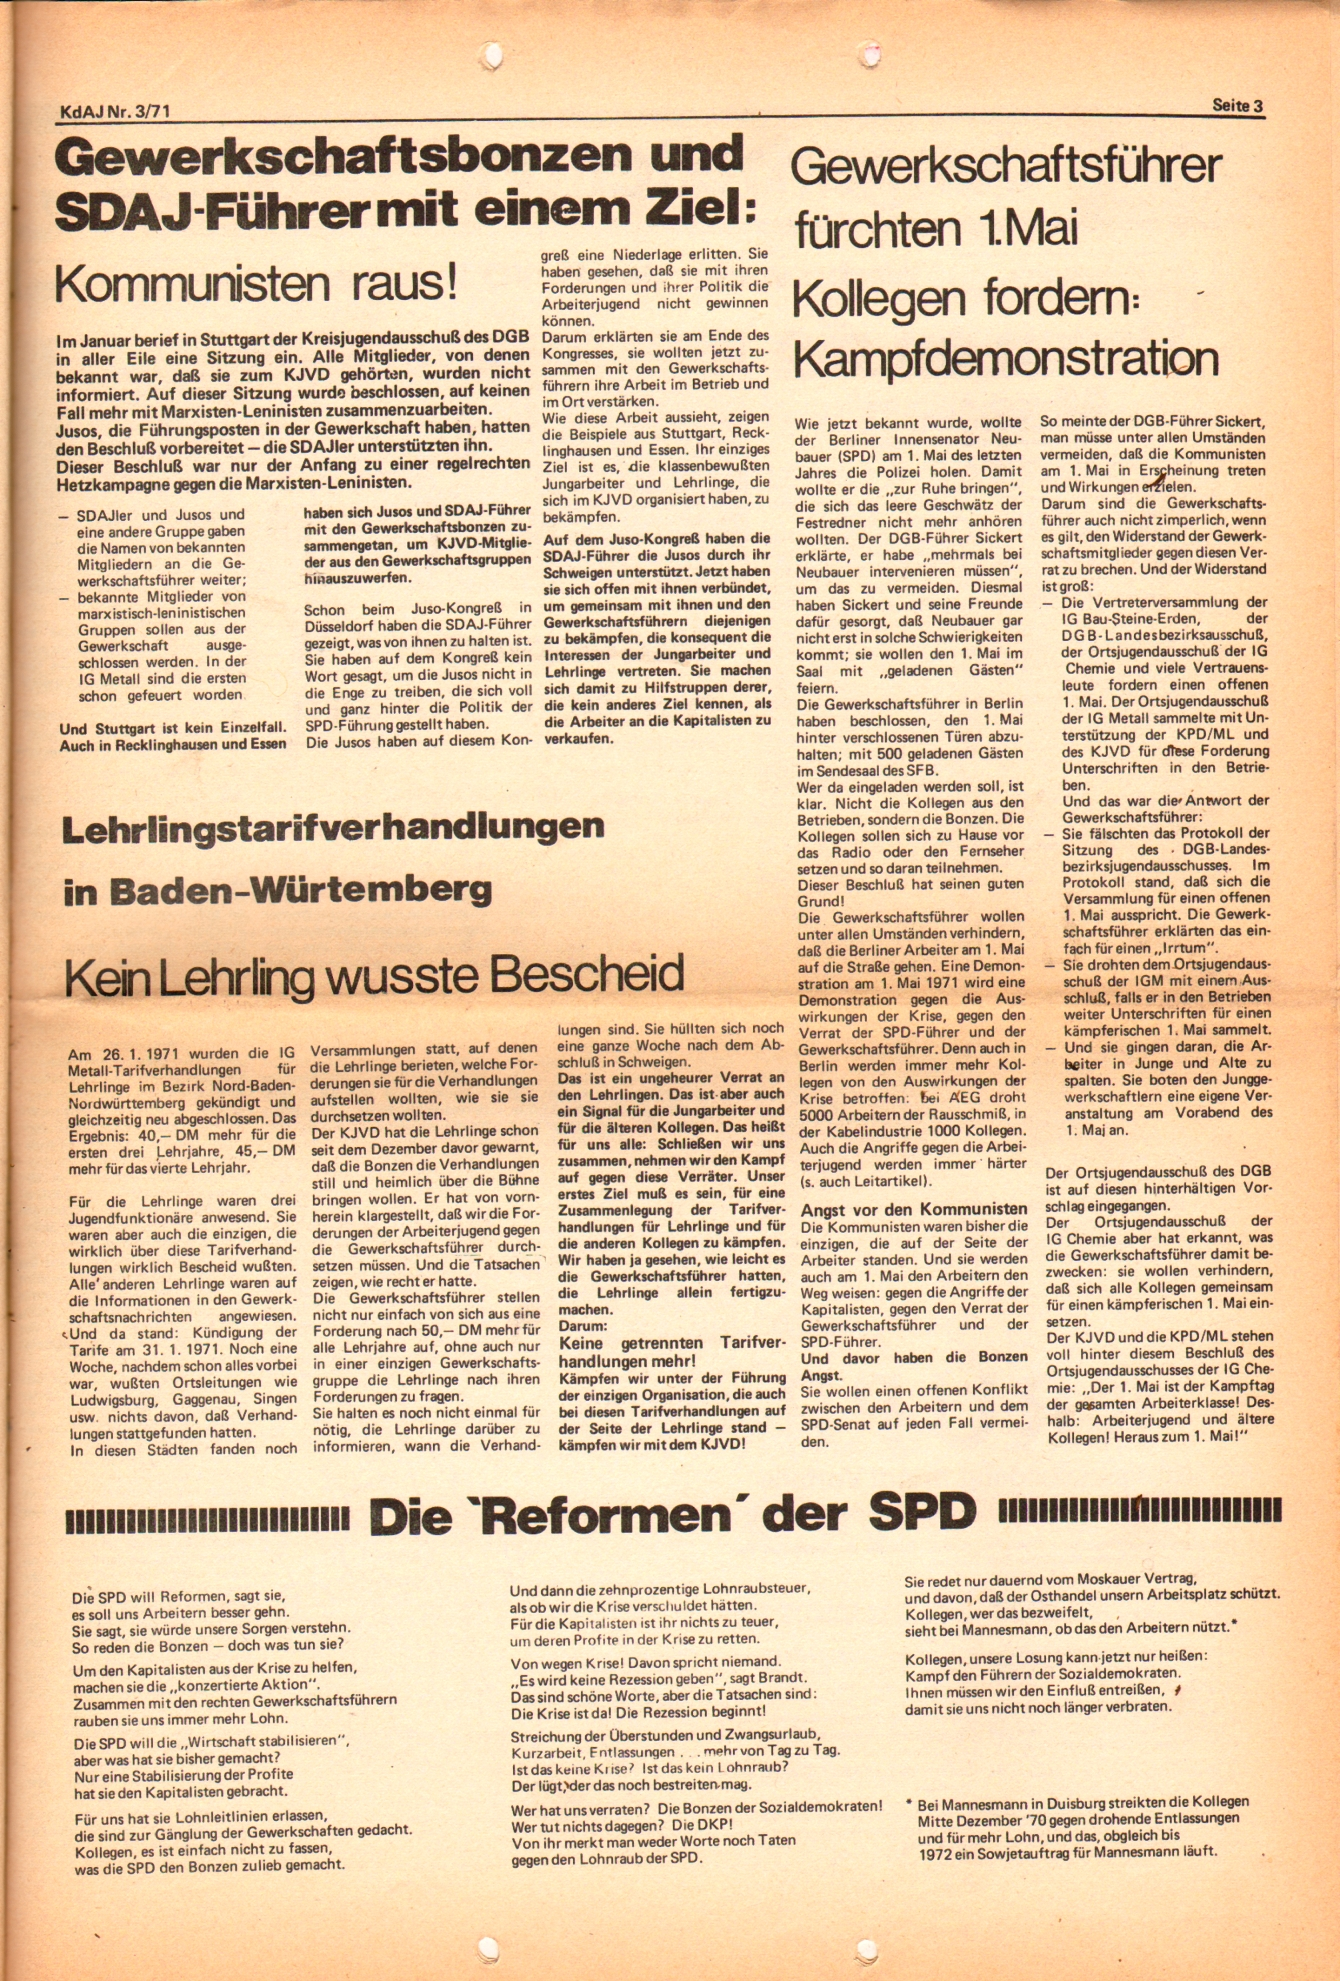 KDAJ, 2. Jg., März 1971, Nr. 3, Seite 3